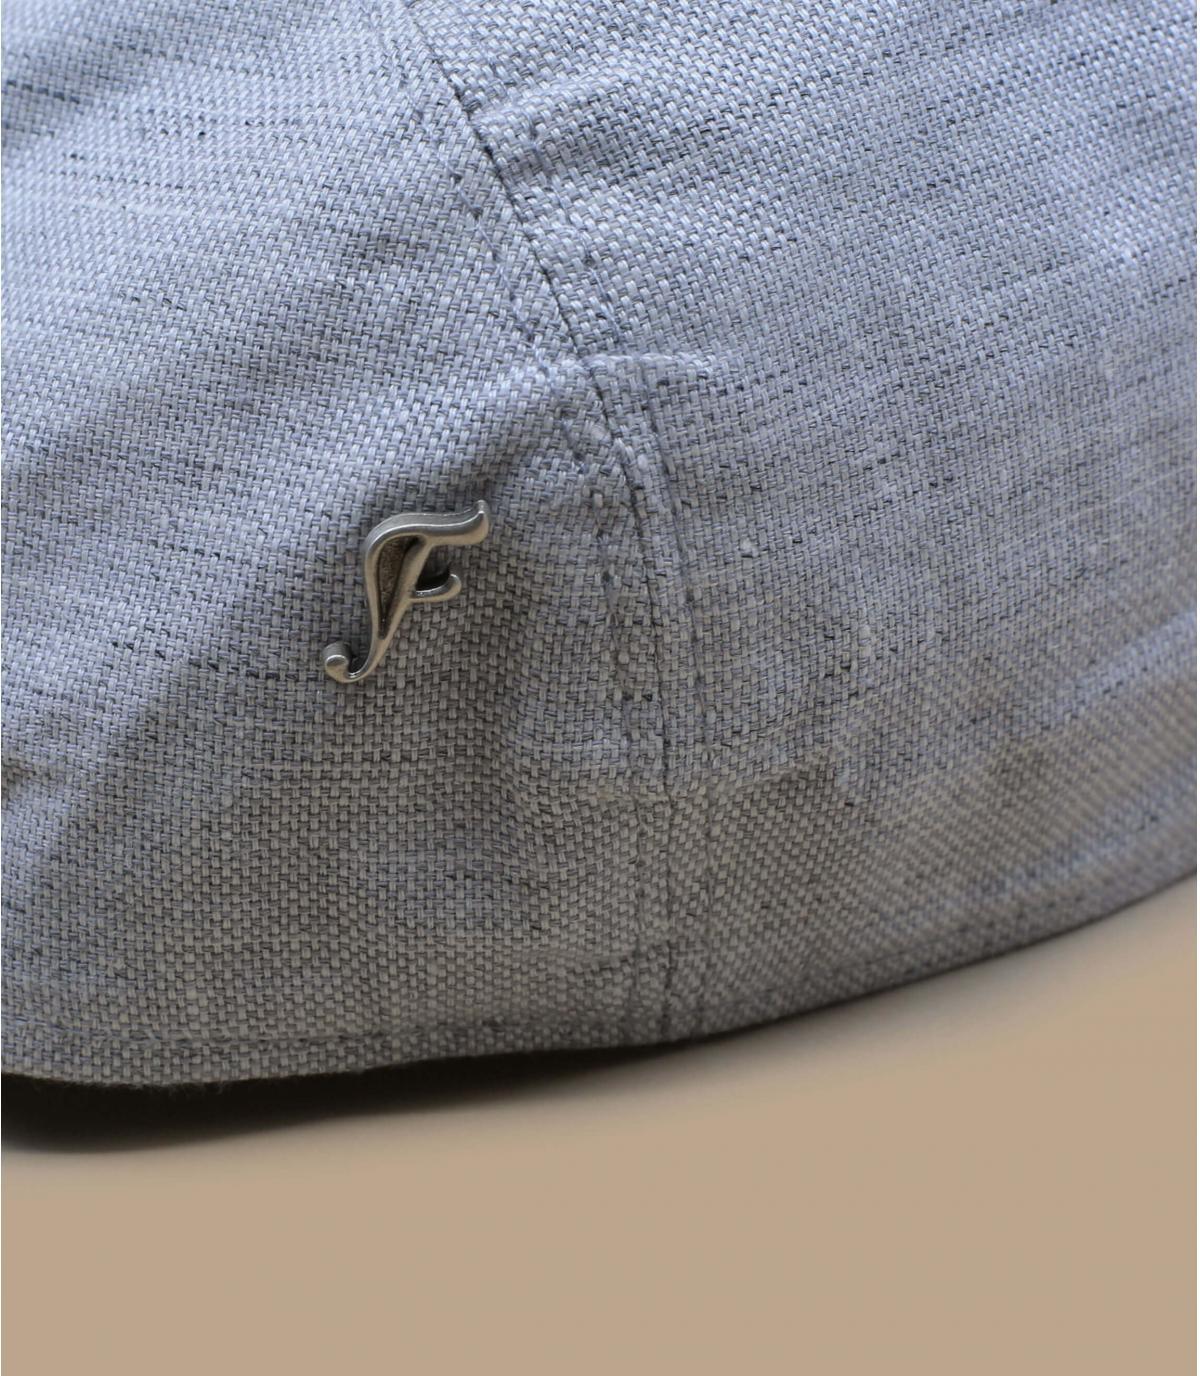 Dettagli Jonas grey - image 2